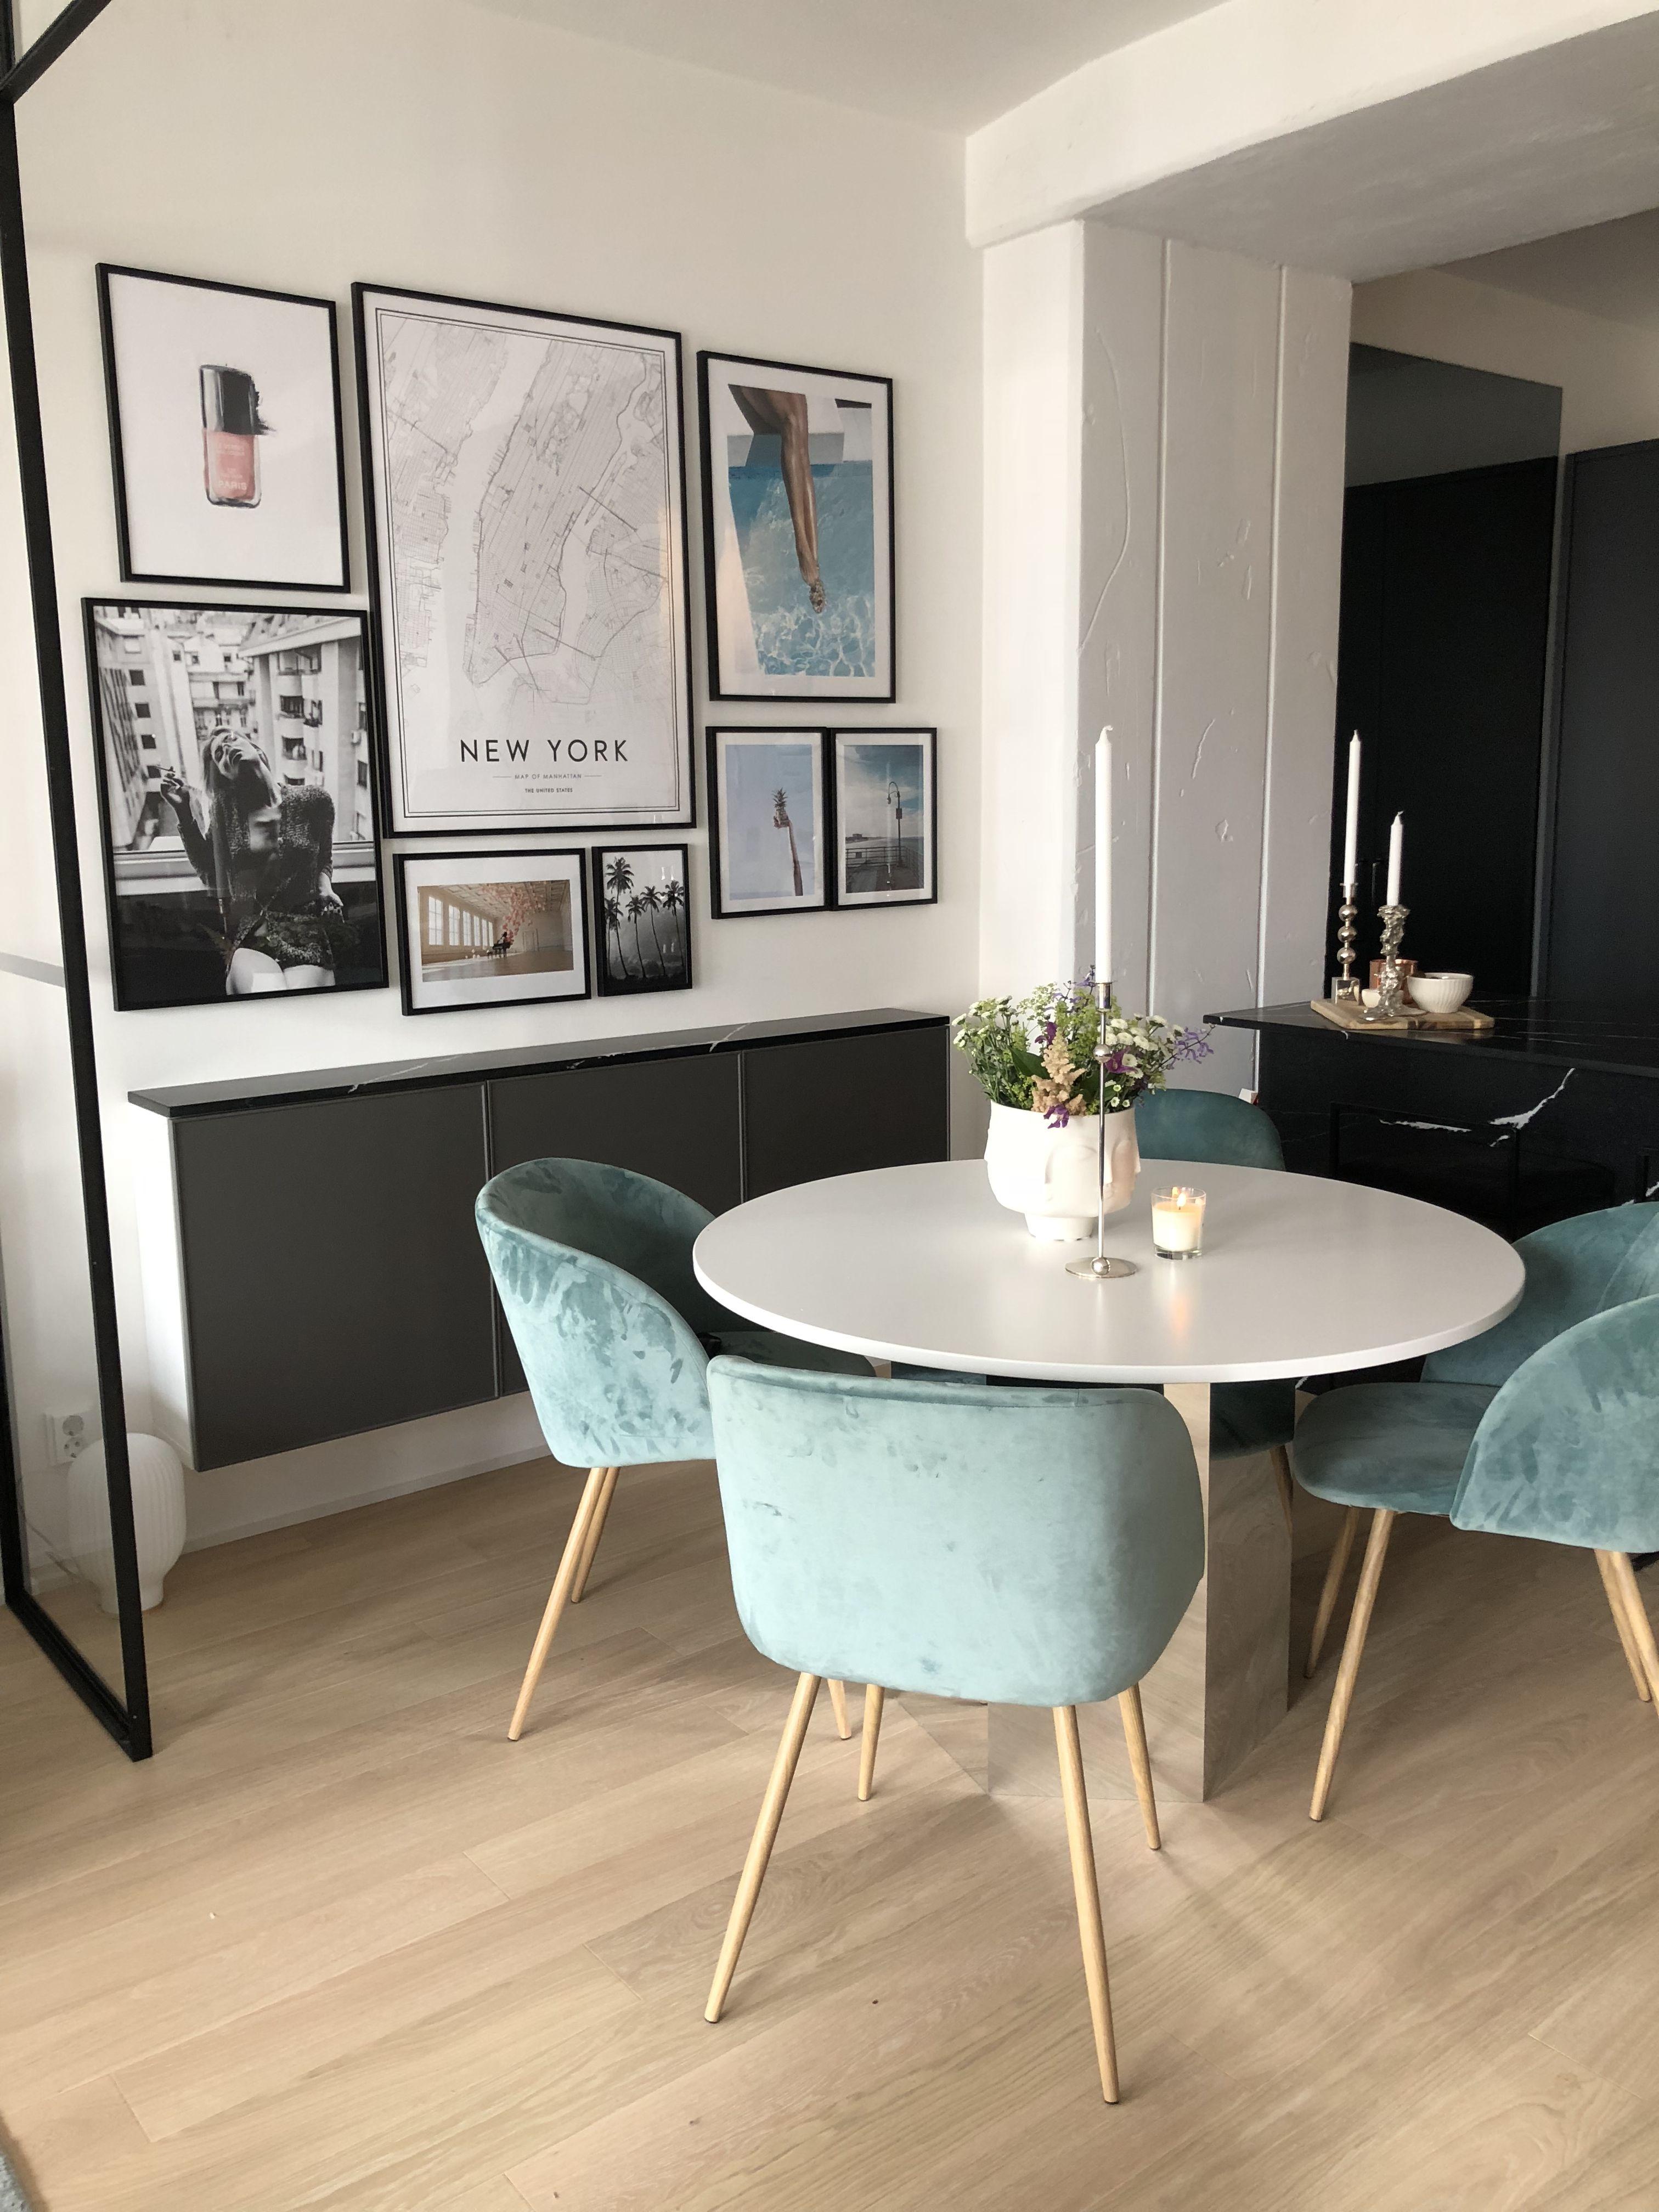 Ikea Small Living Room Design Ideas: Pin By Ewa Ostrowicz On Interior Design In 2019